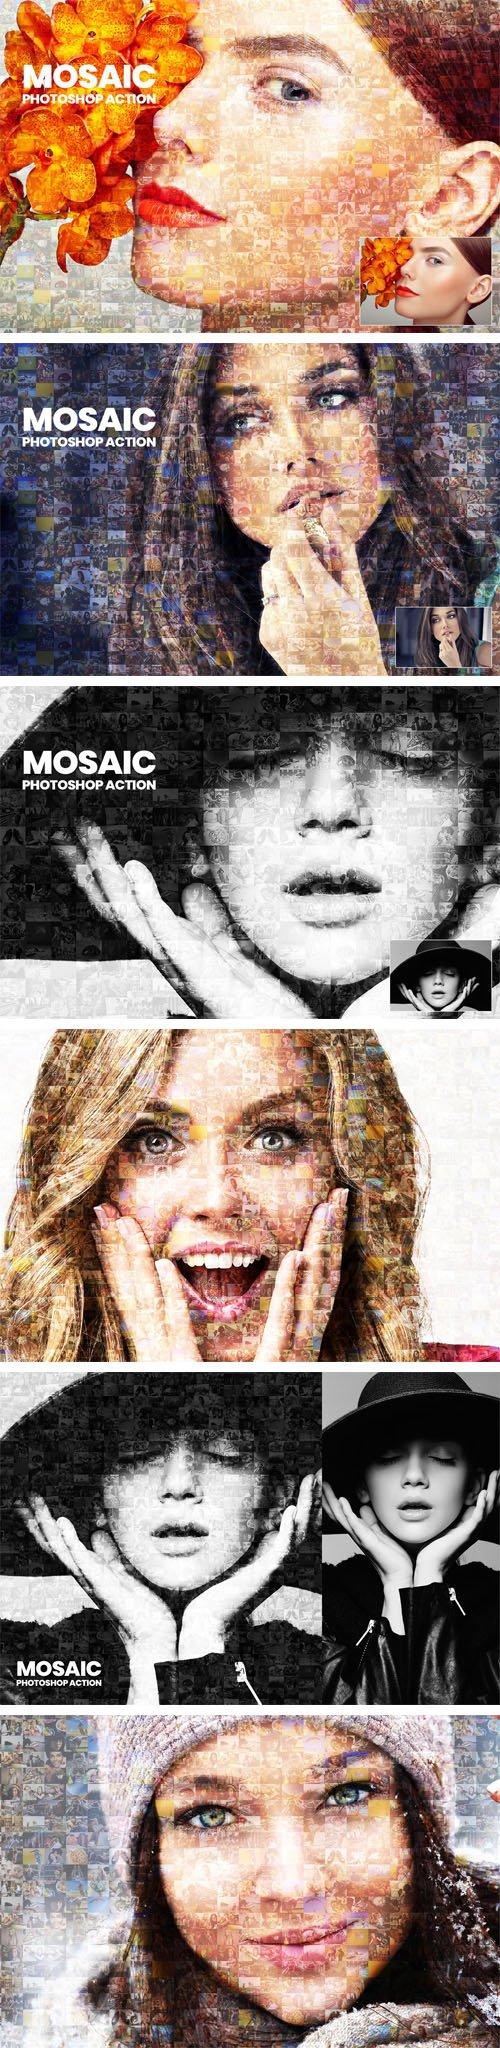 Mosaic Photoshop Actions